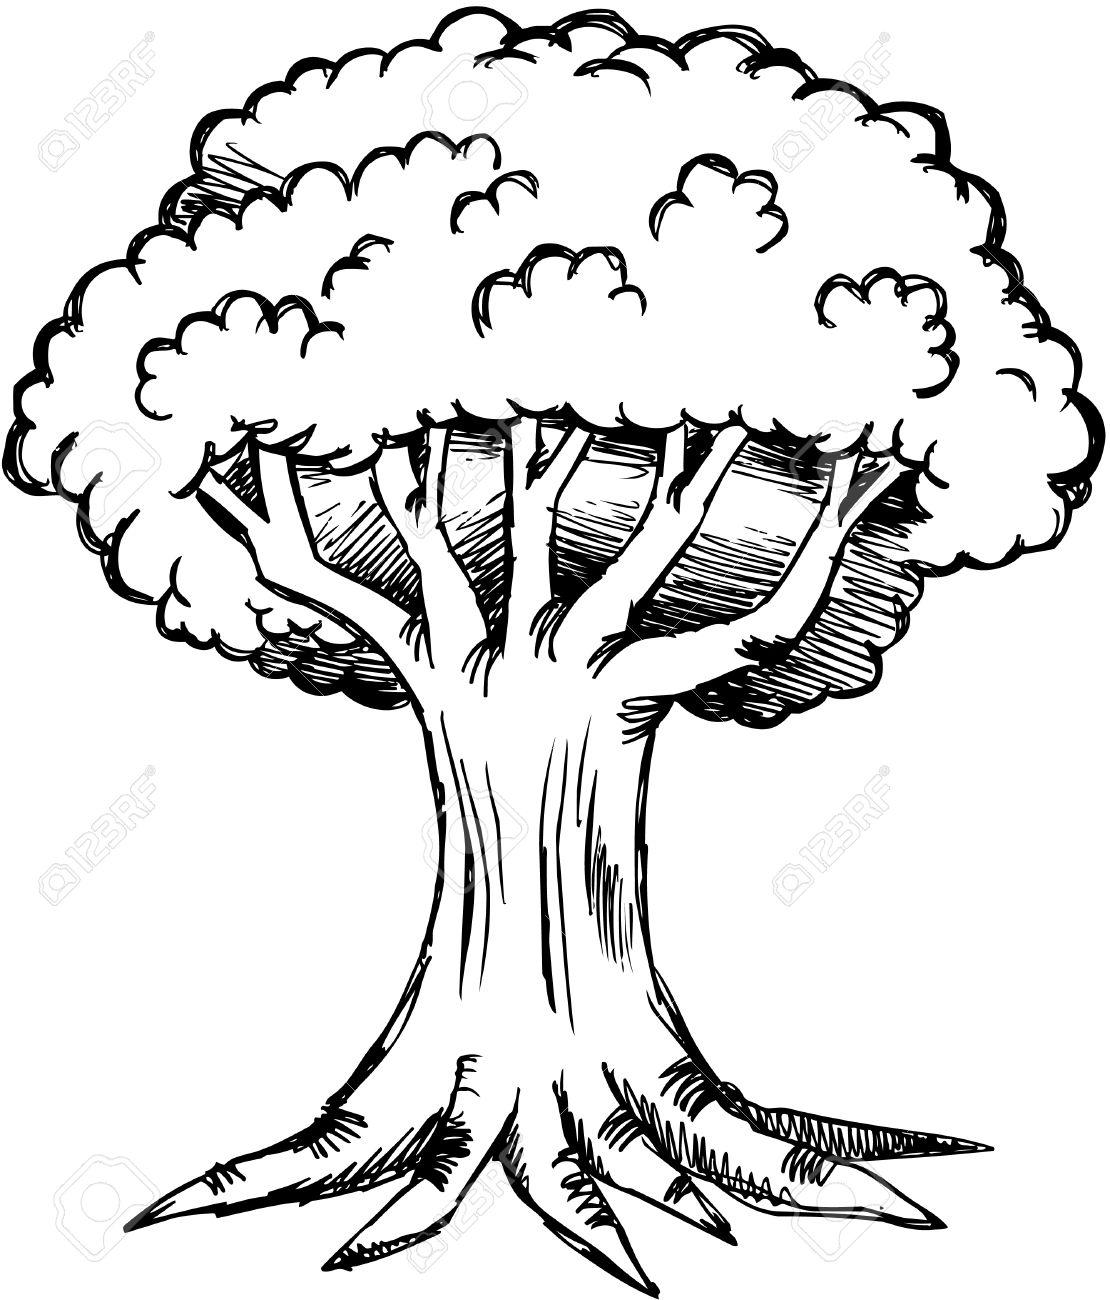 Tree cartoon drawing free download best tree cartoon